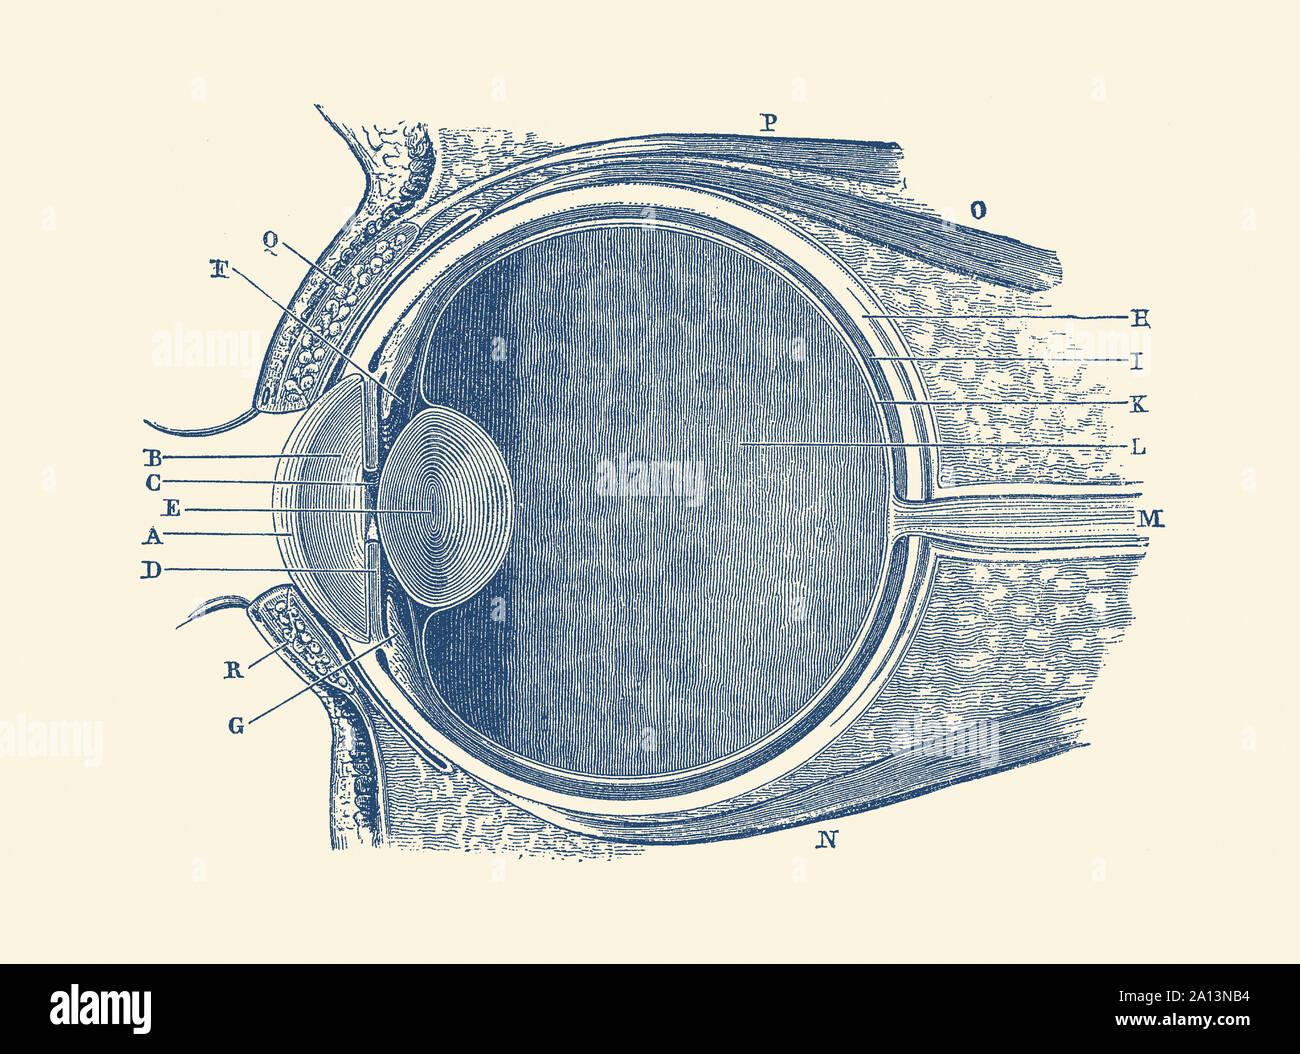 Simple Human Eye Diagram Sketch Of The Human Eye